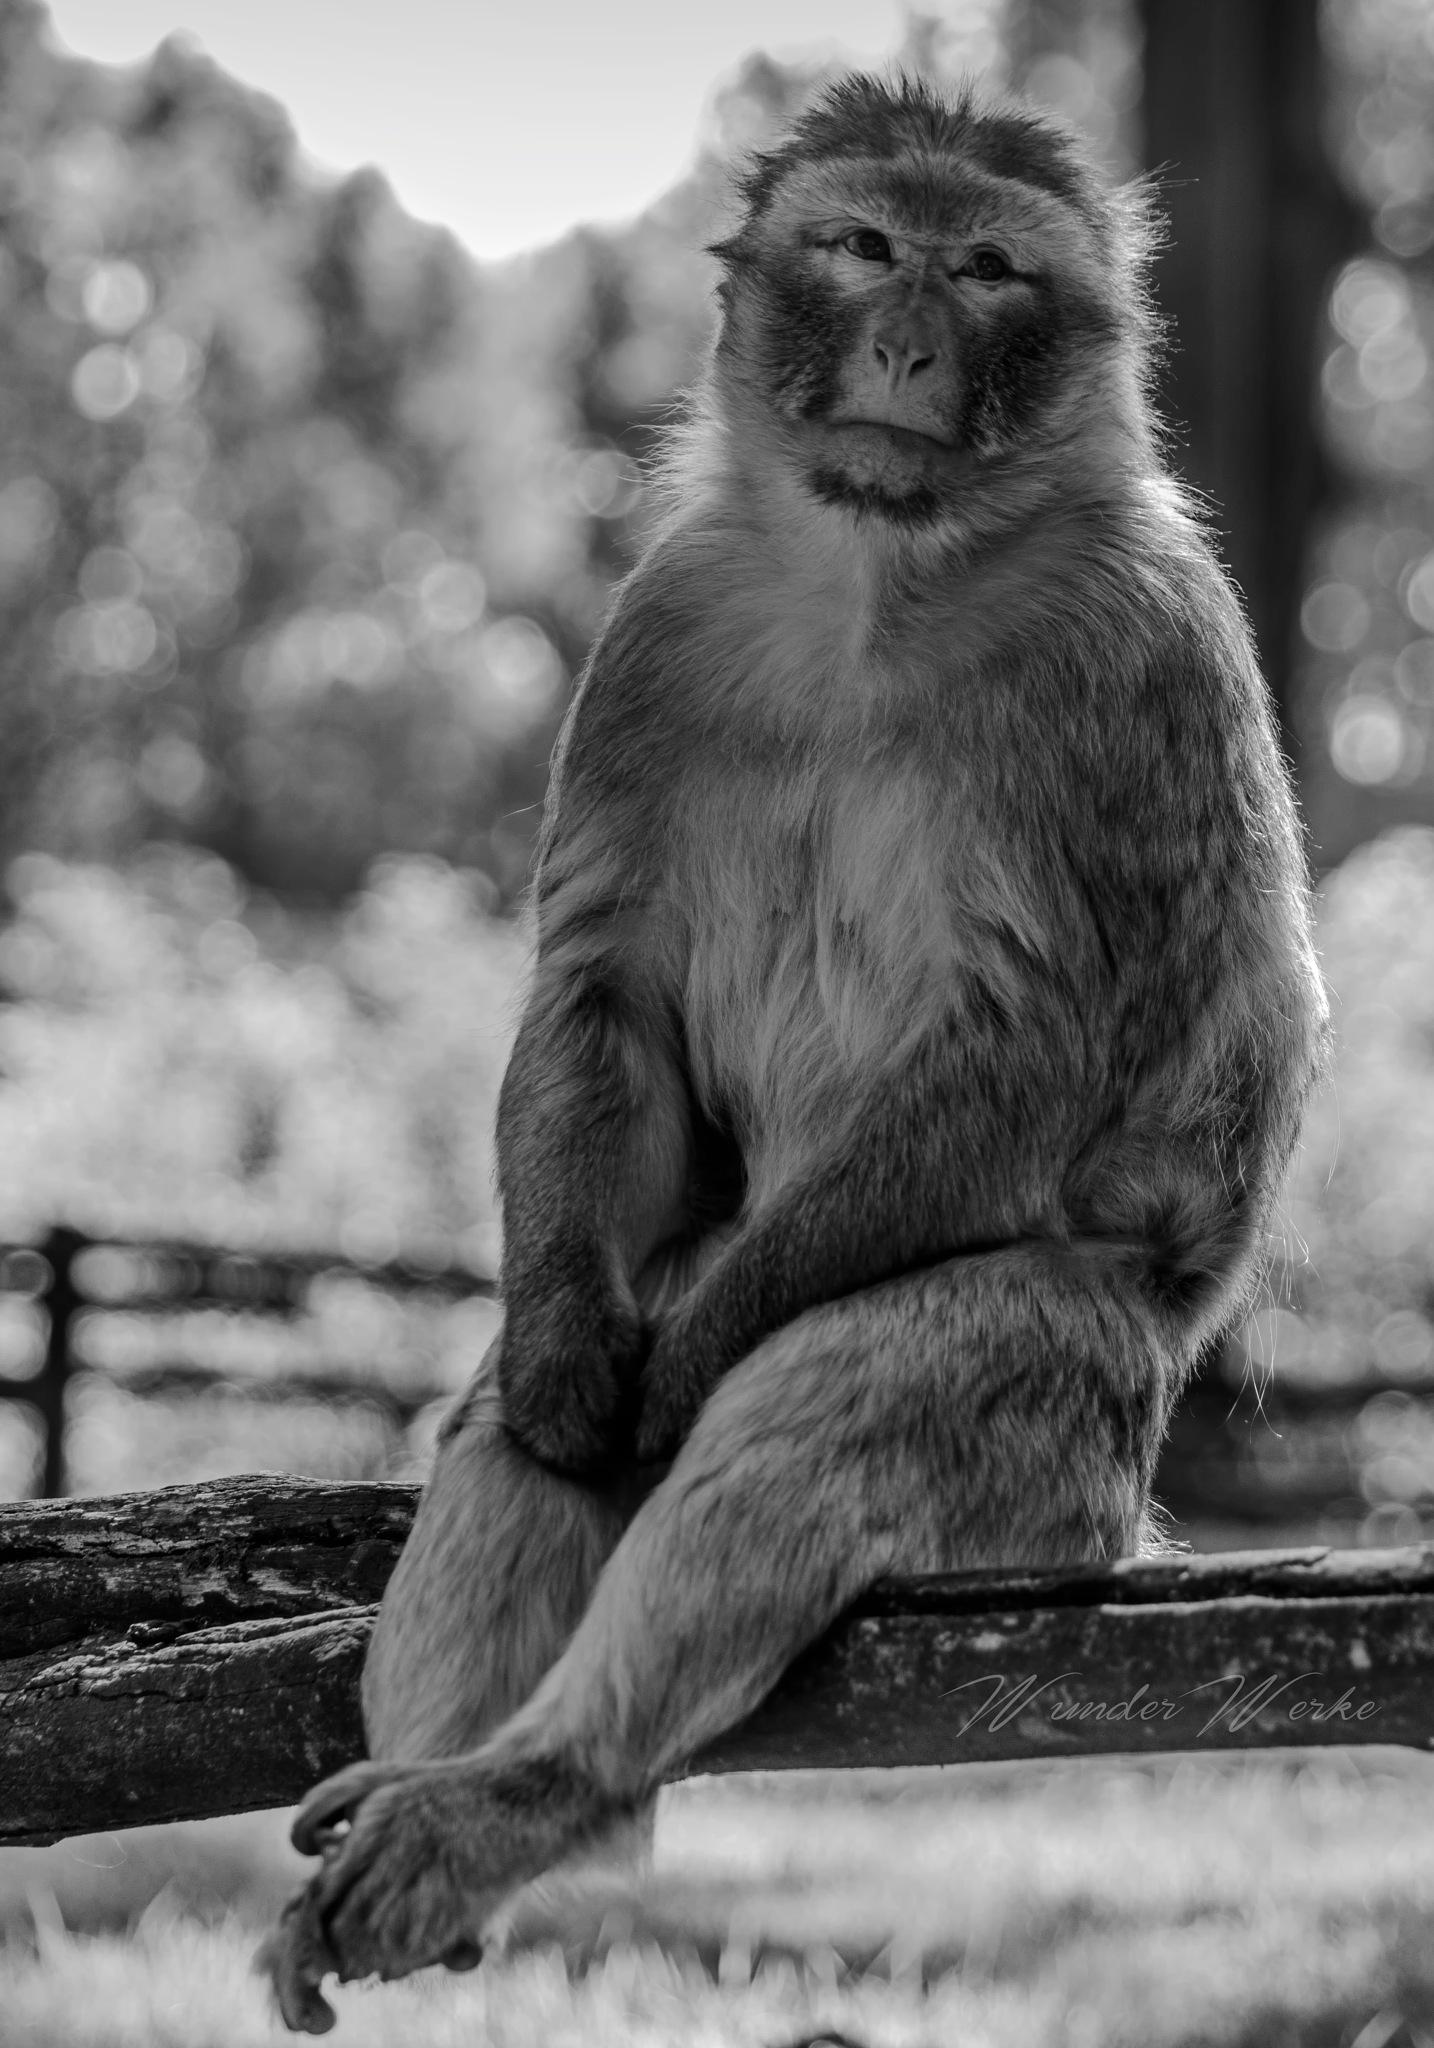 Ape by Wunderwerke.design